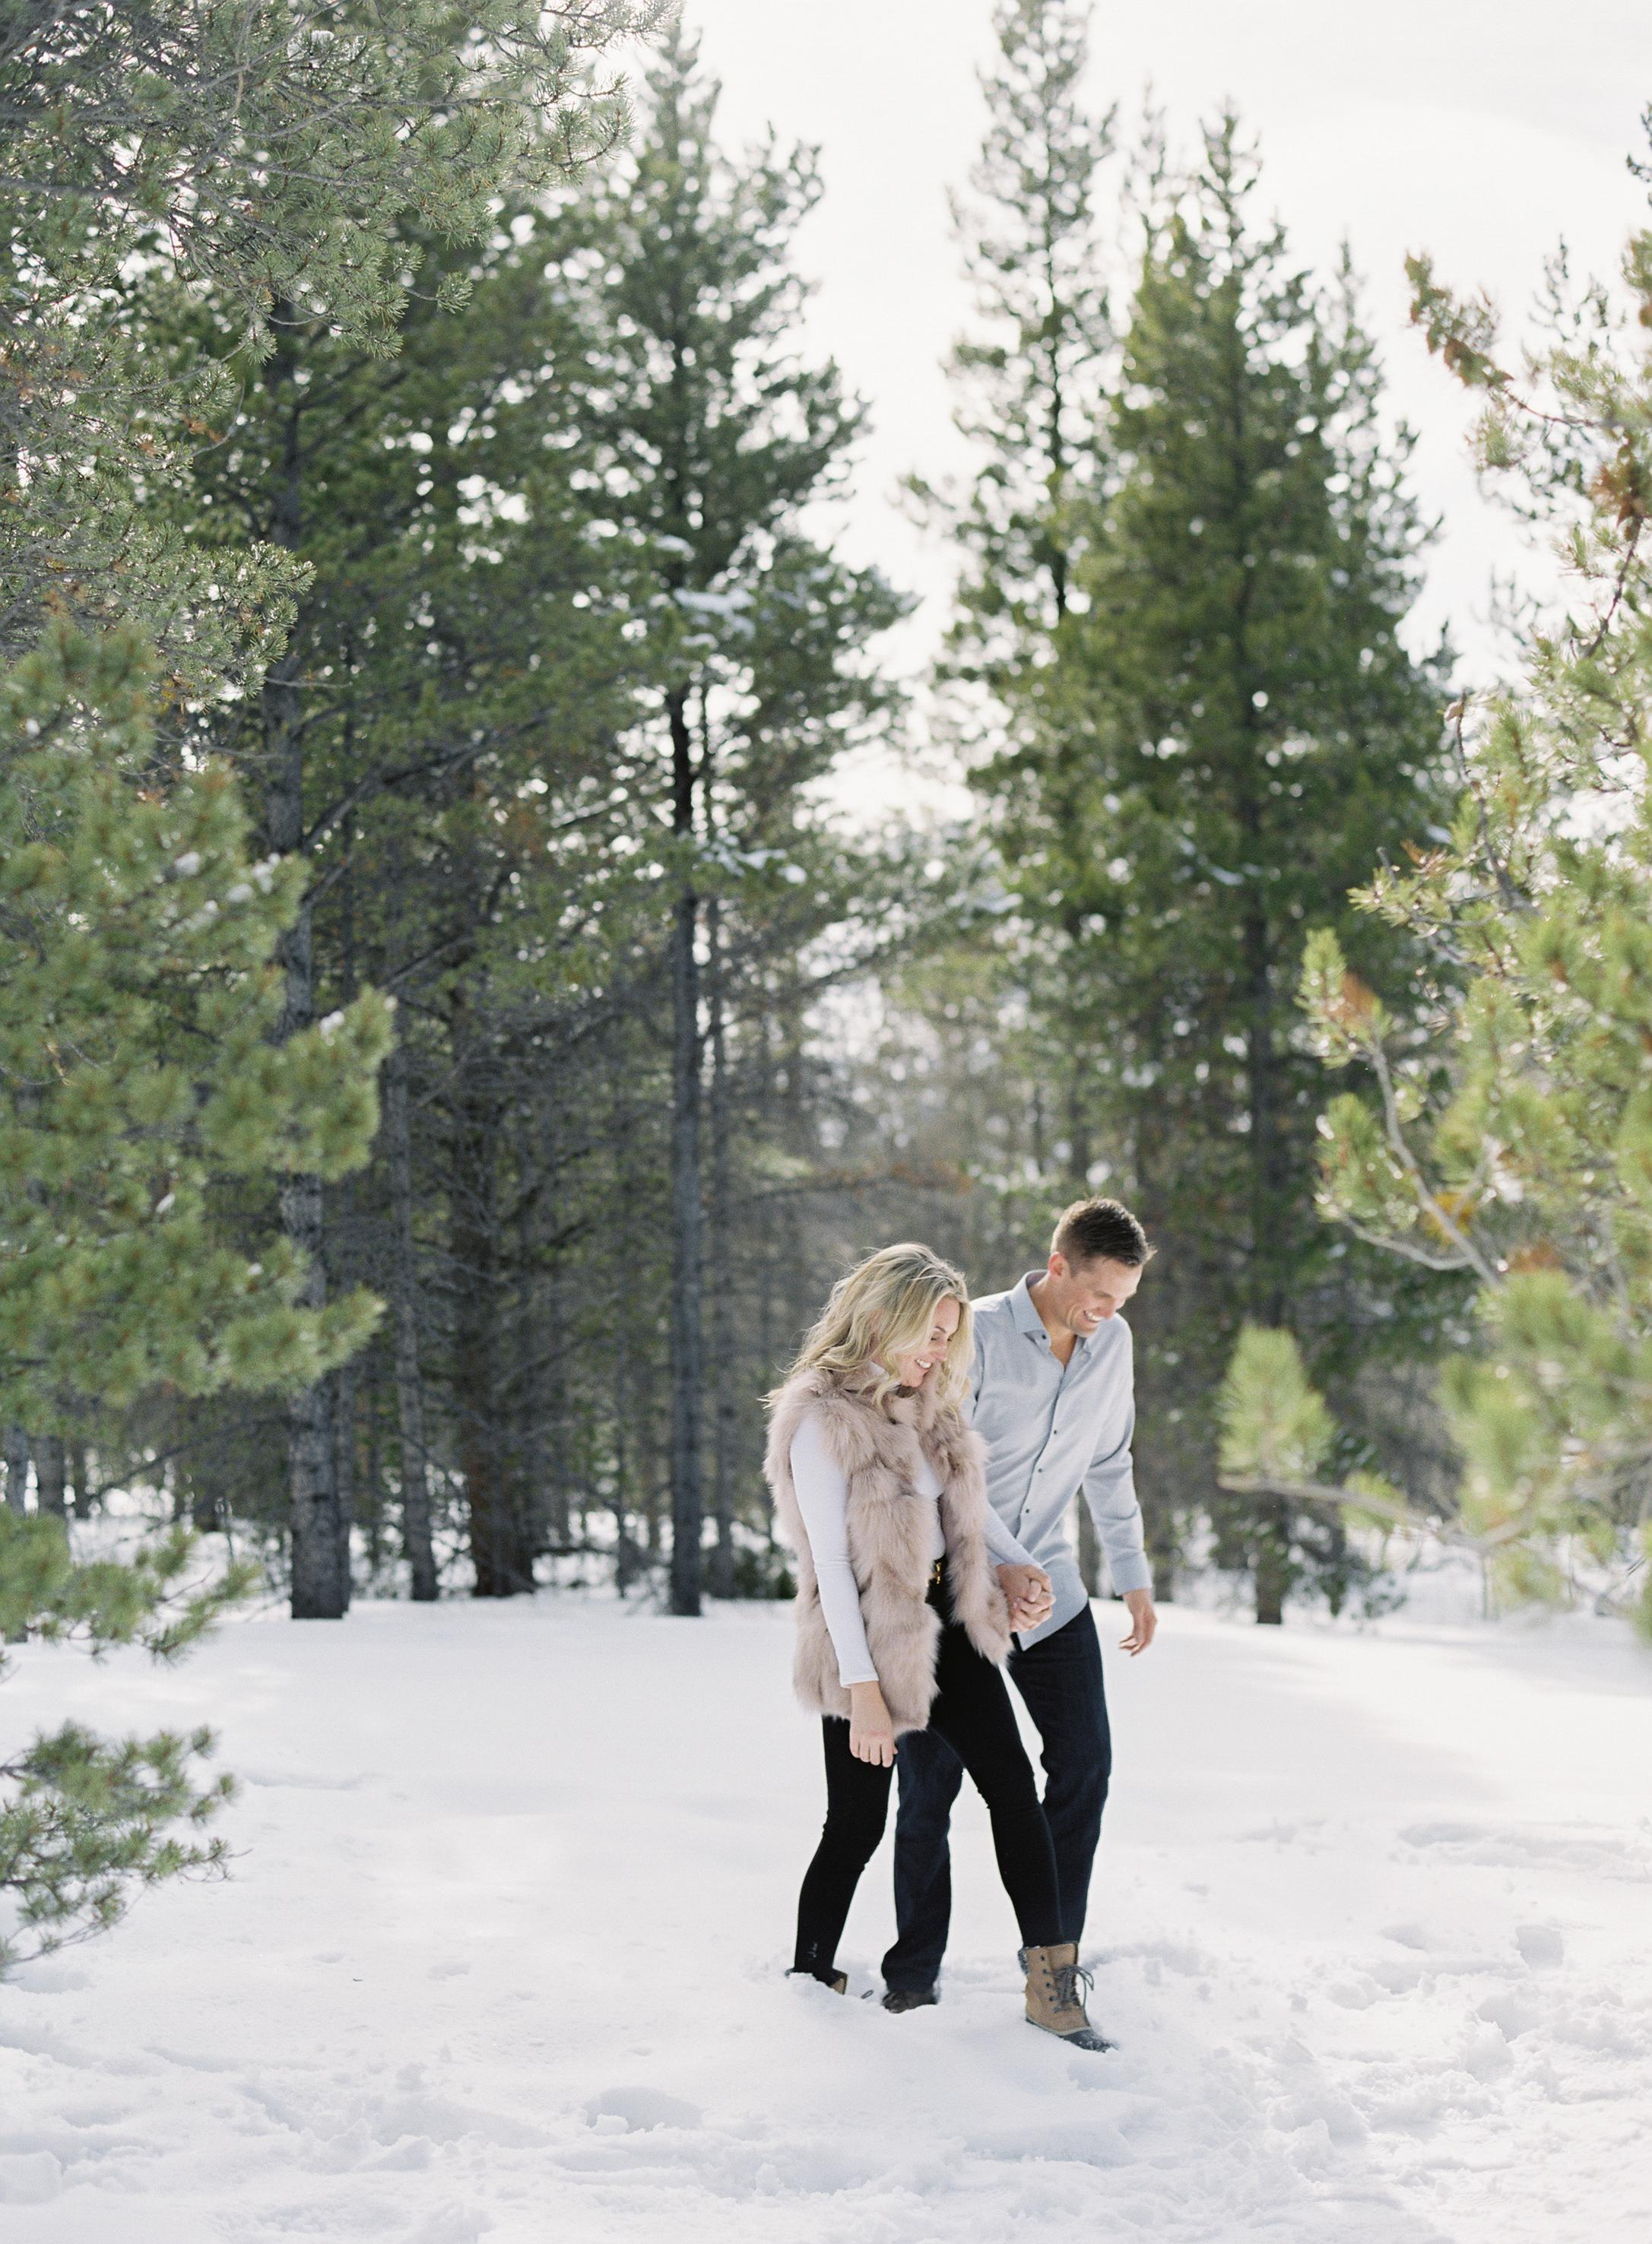 Sarah and John Engaged-Carrie King Photographer12.jpg